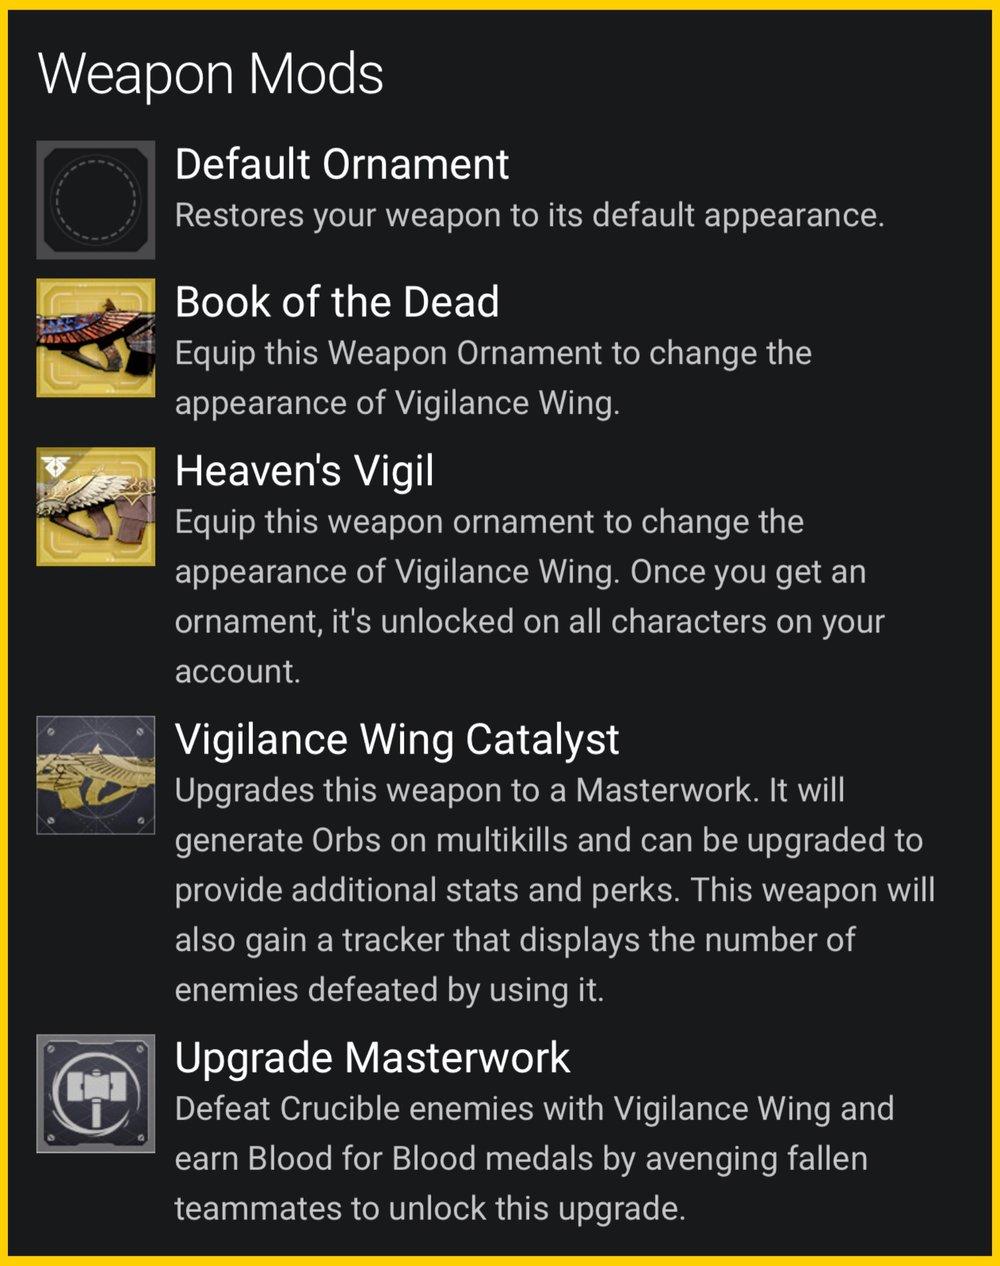 Weapon Mods.JPEG